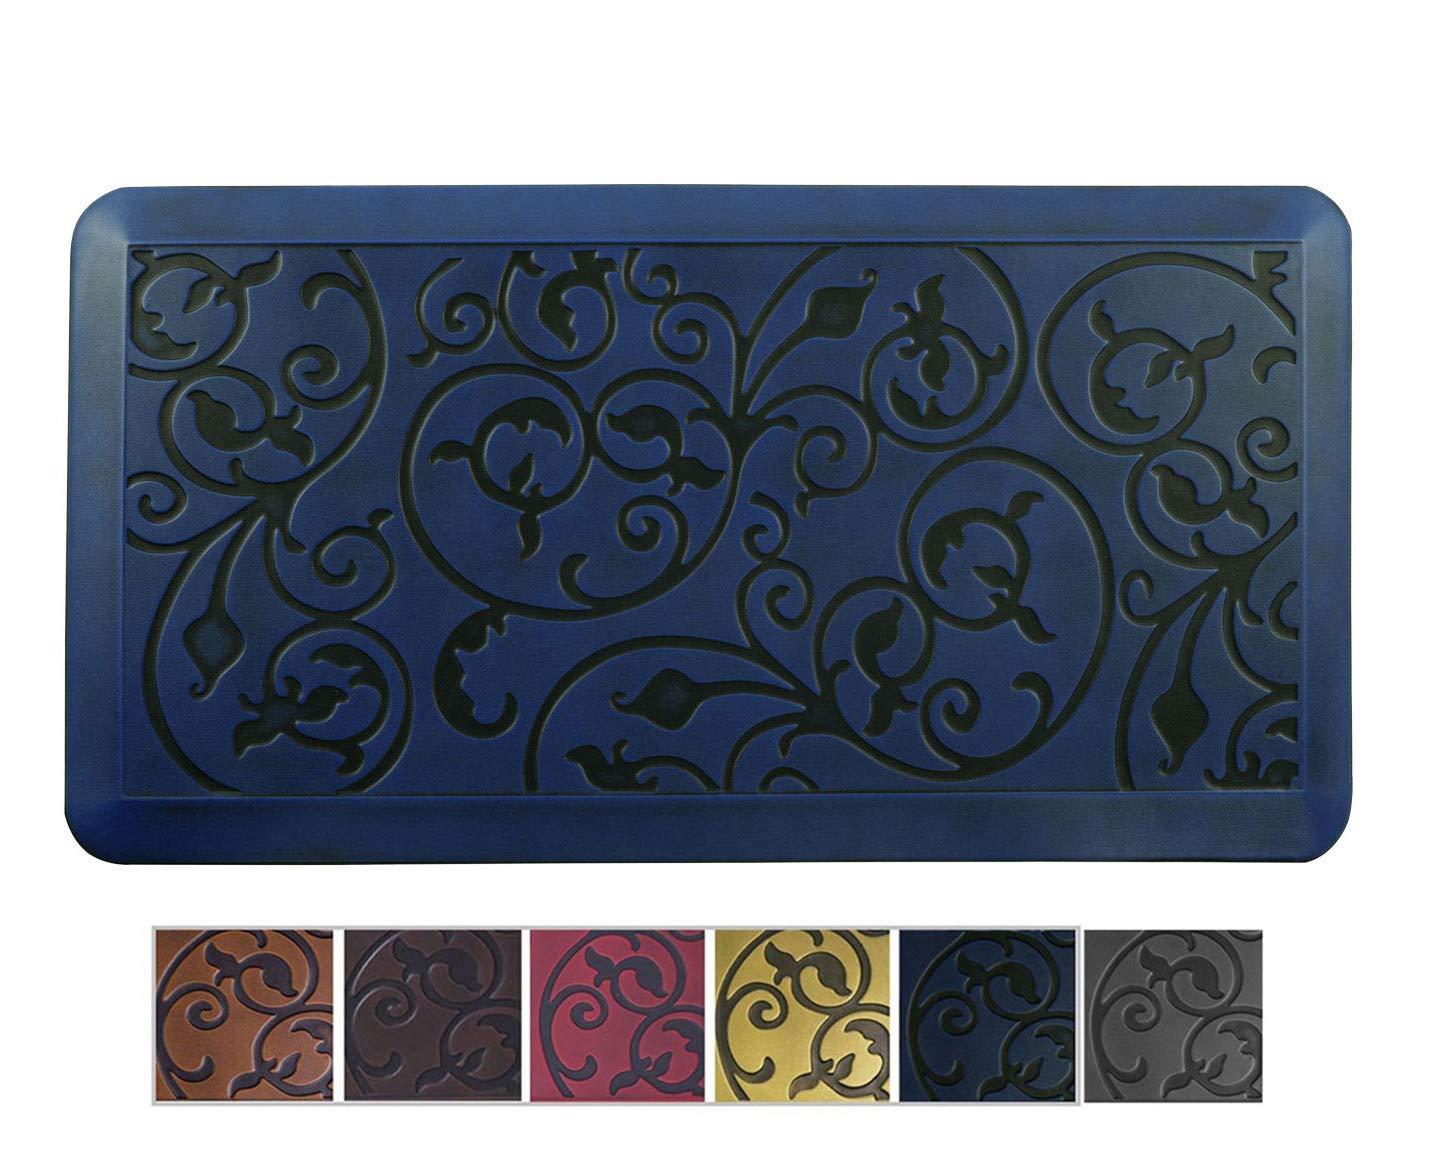 Amcomfy Kitchen Anti Fatigue Mat,Comfort Floor Mats,Standing Desk Mats,Antique Series (20 x 39 x 3/4 Inches, Antique Medieval Blue)